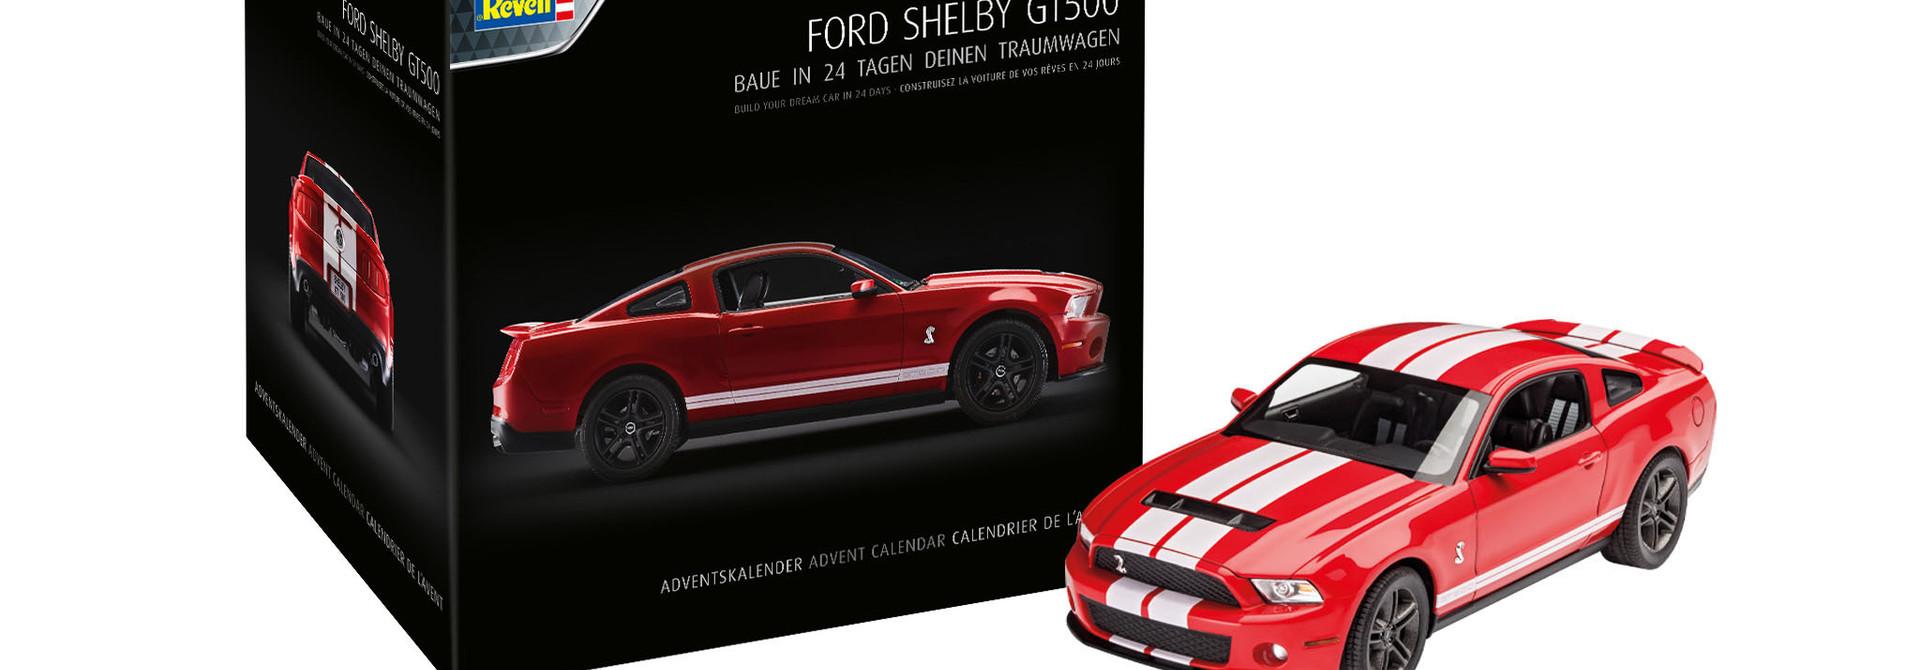 1:25 Adventskalender Ford Shelby GT